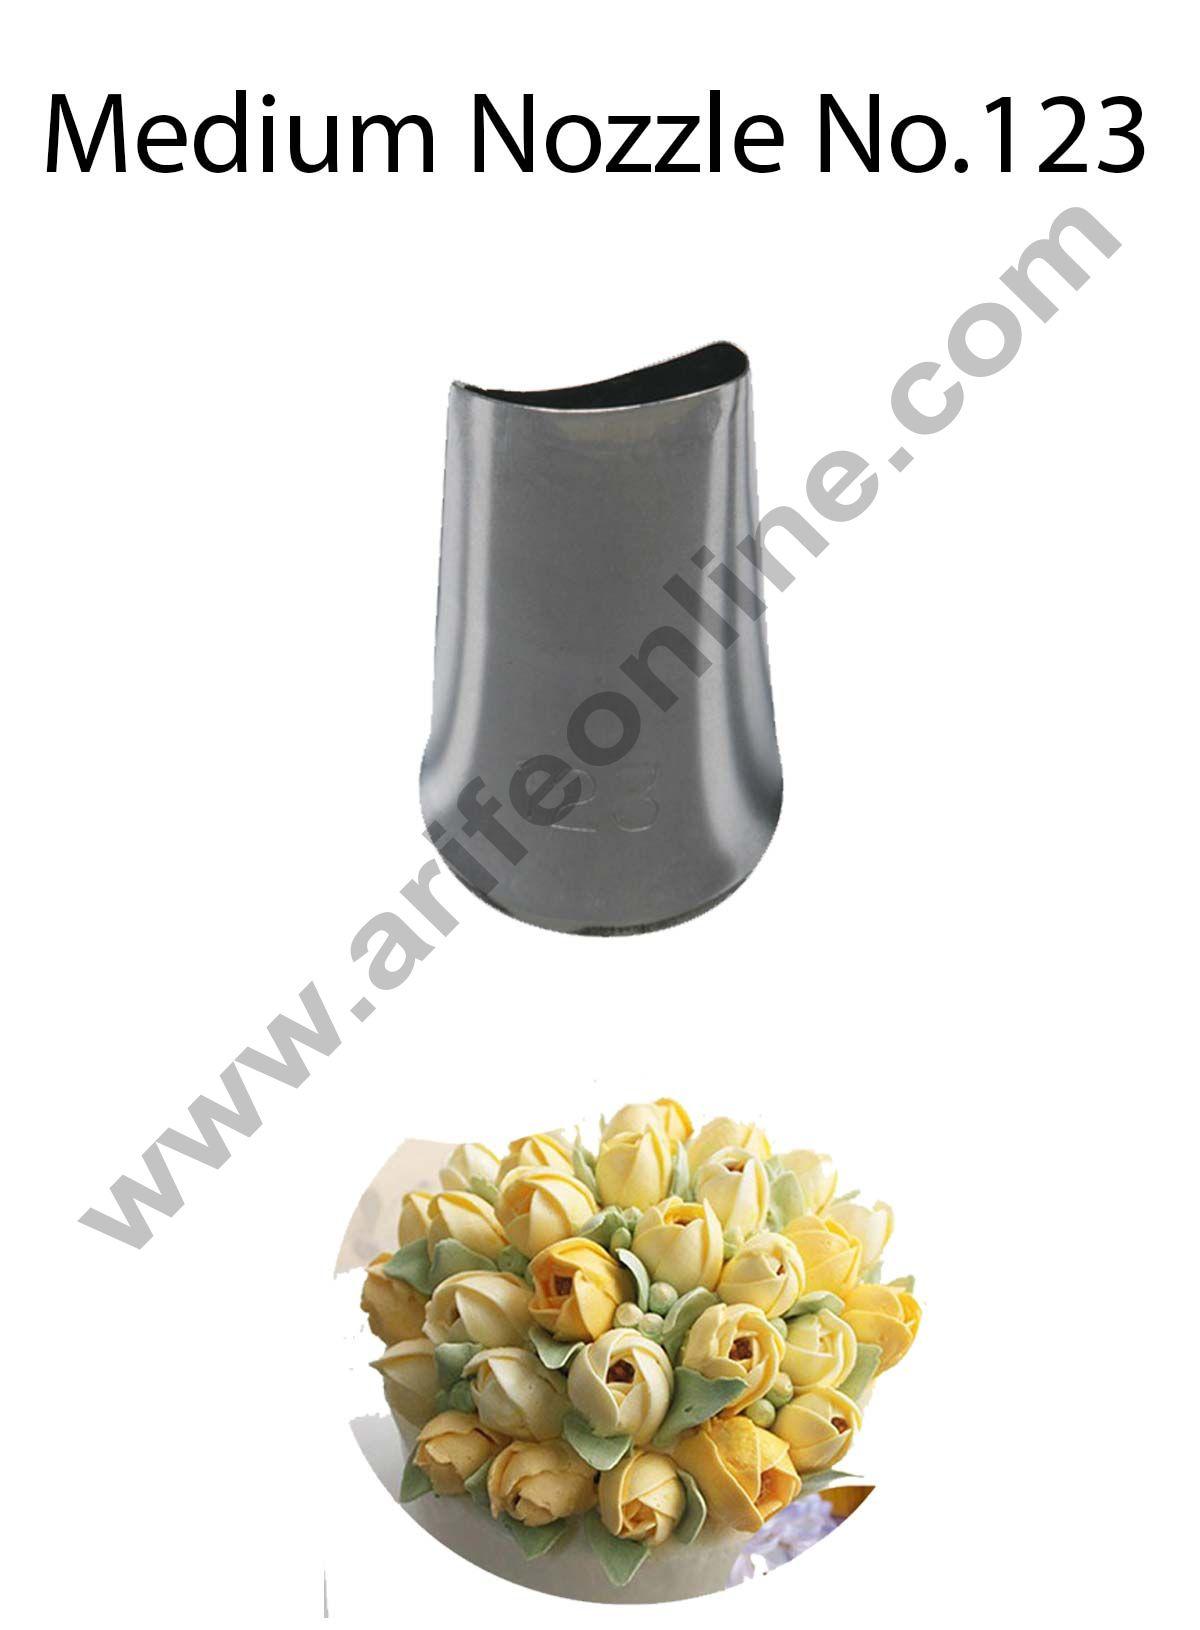 Cake Decor Medium Nozzle - No. 123 Petal Piping Nozzle